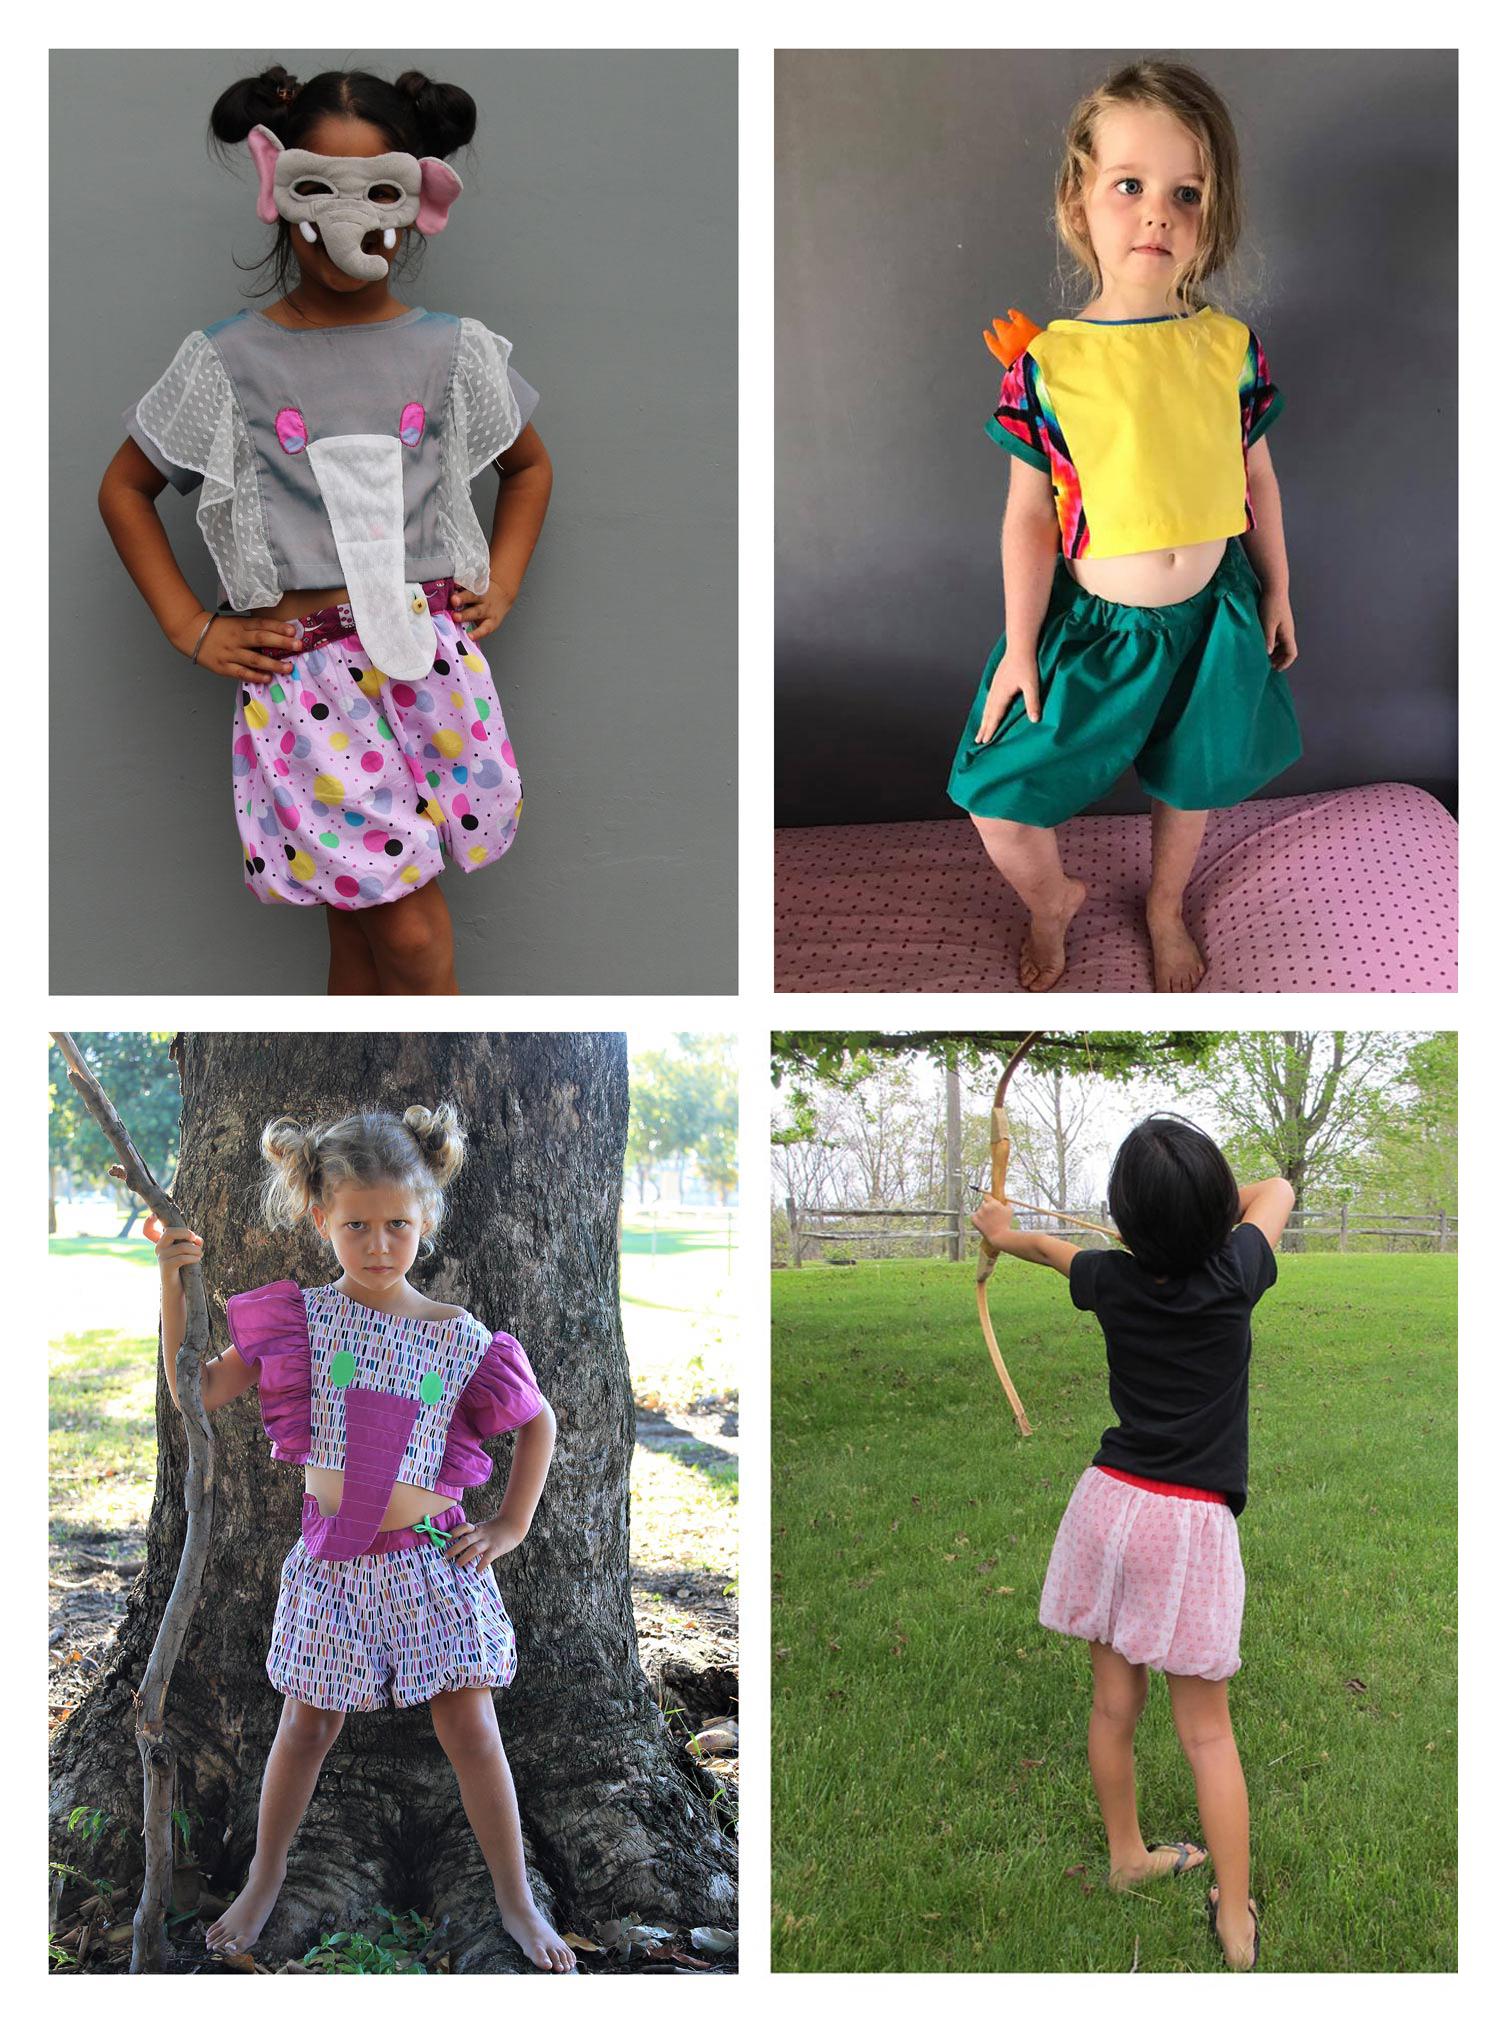 tester photo credits   top left: Kiran   top right: Ari, Max-California   bottom left: Kate   bottom right: Jill